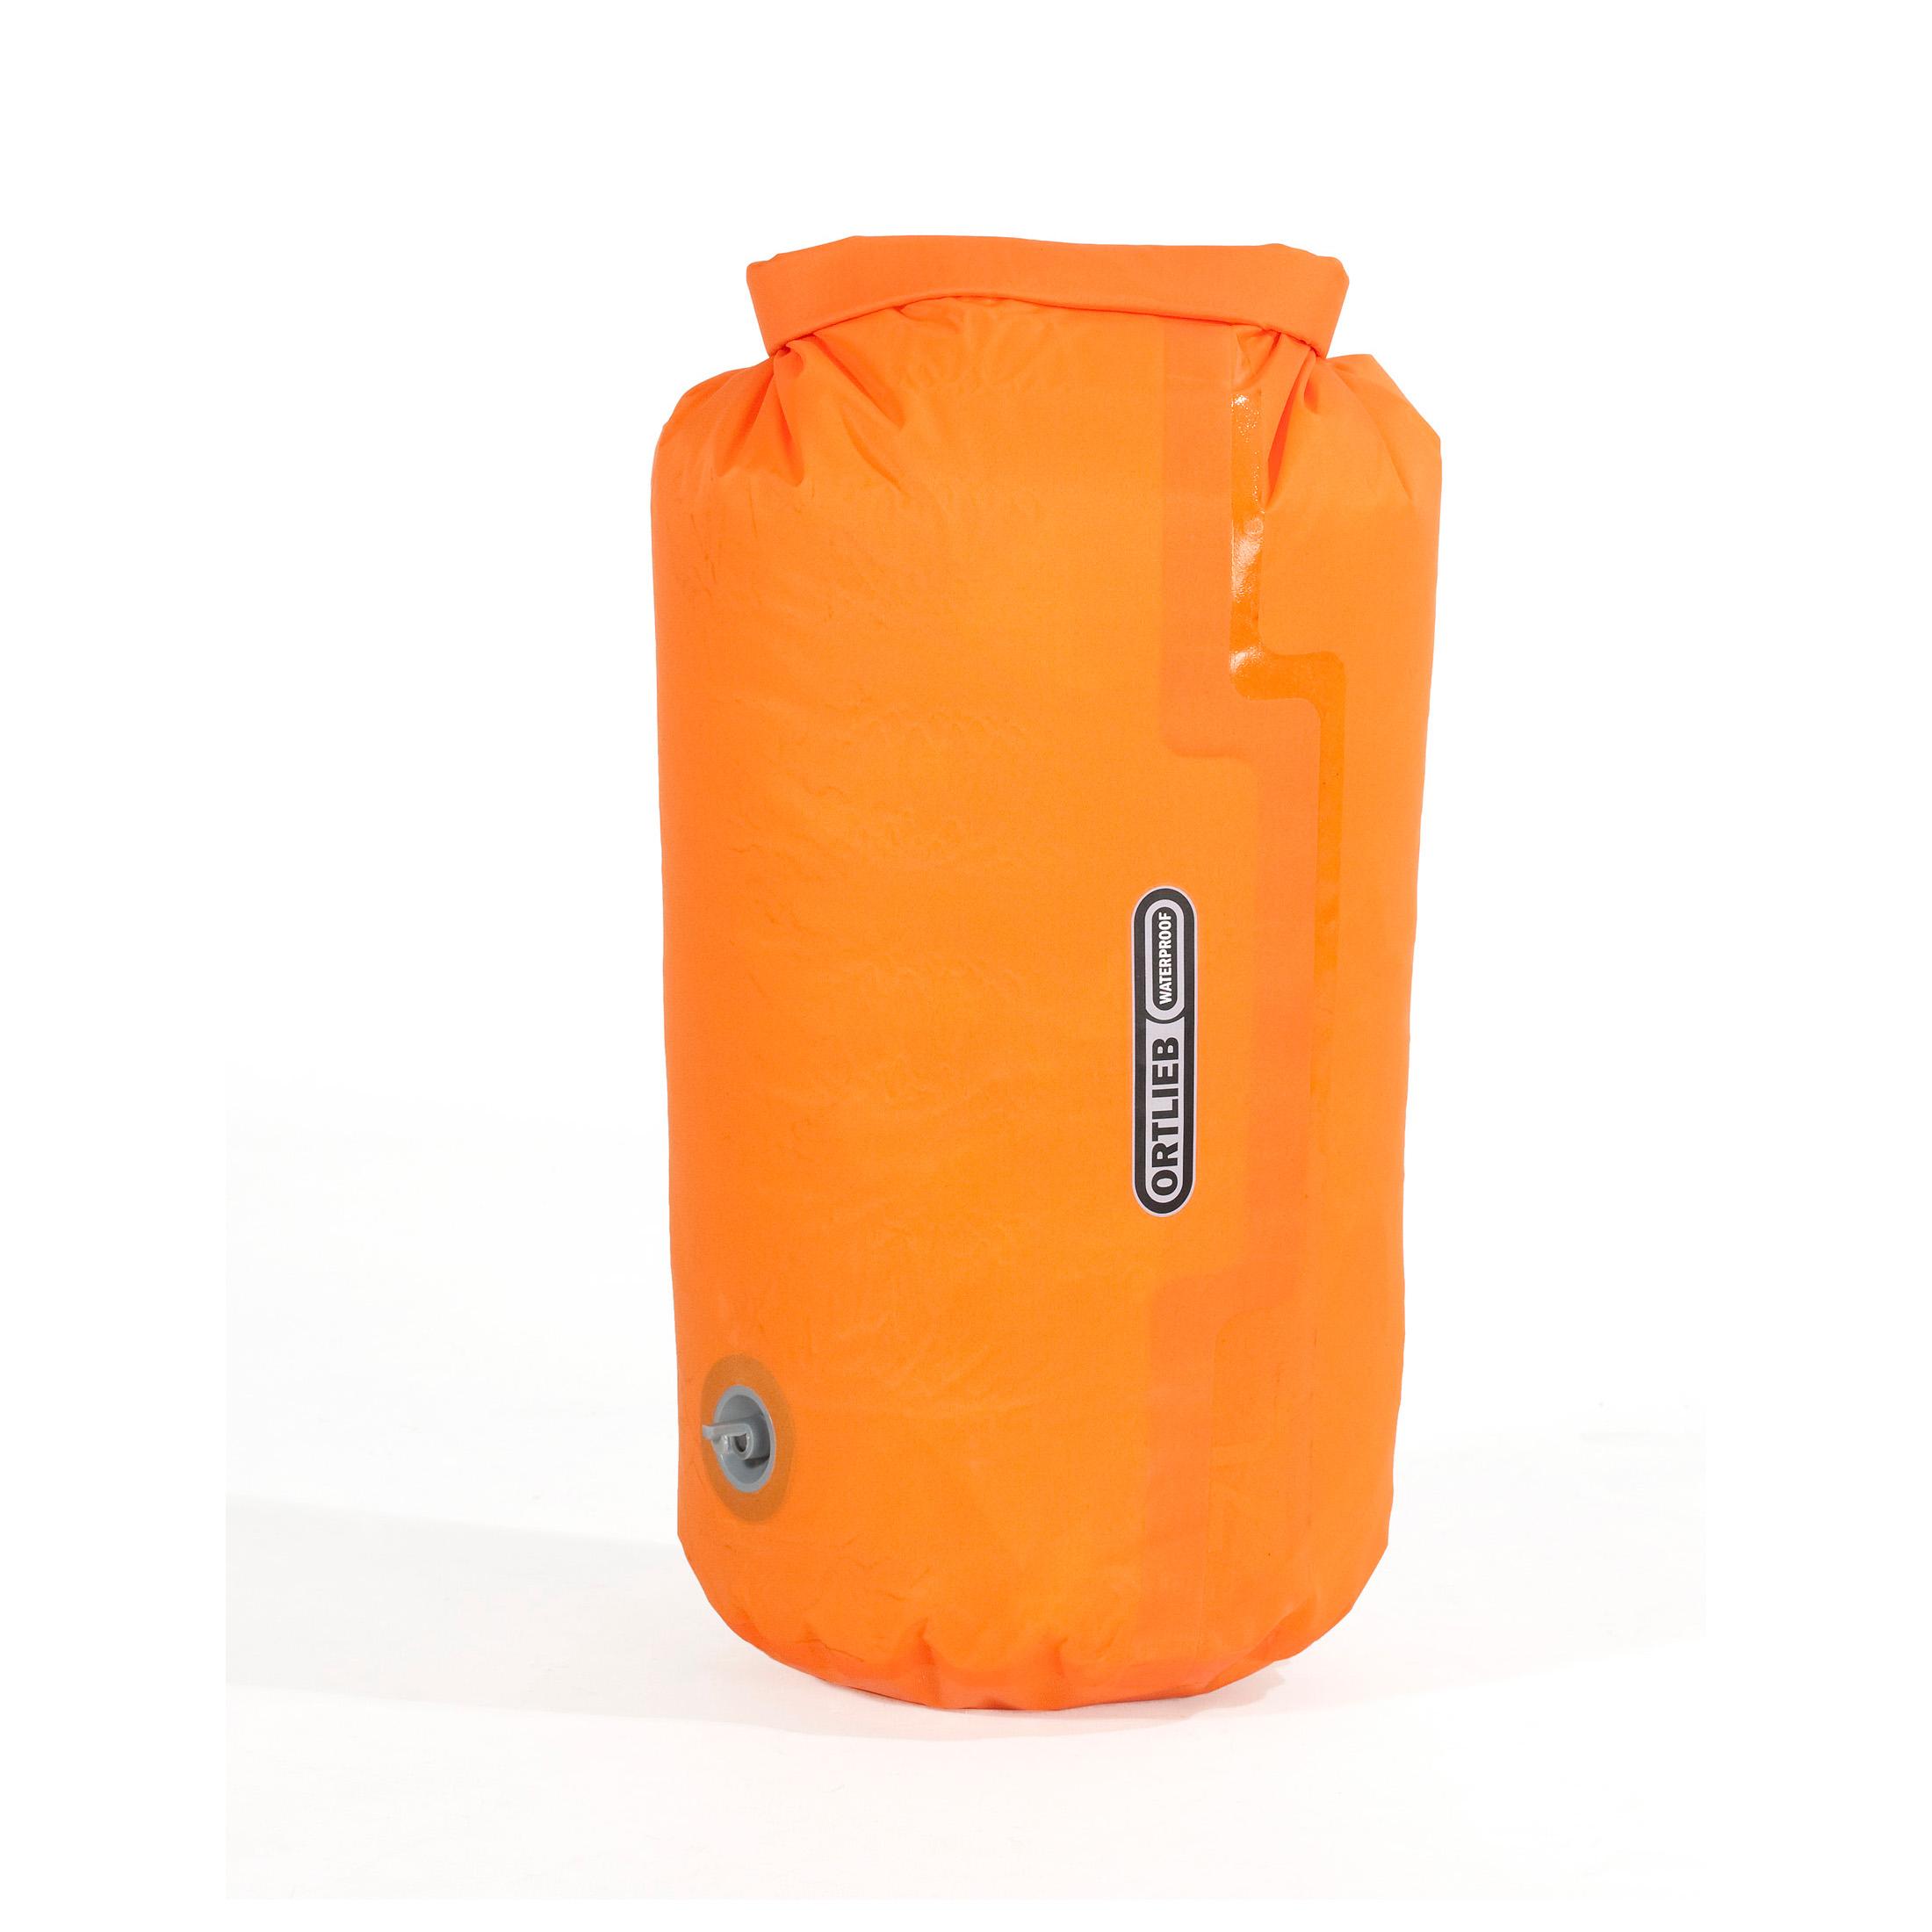 Ortlieb Dry-Bag PS10 Valve